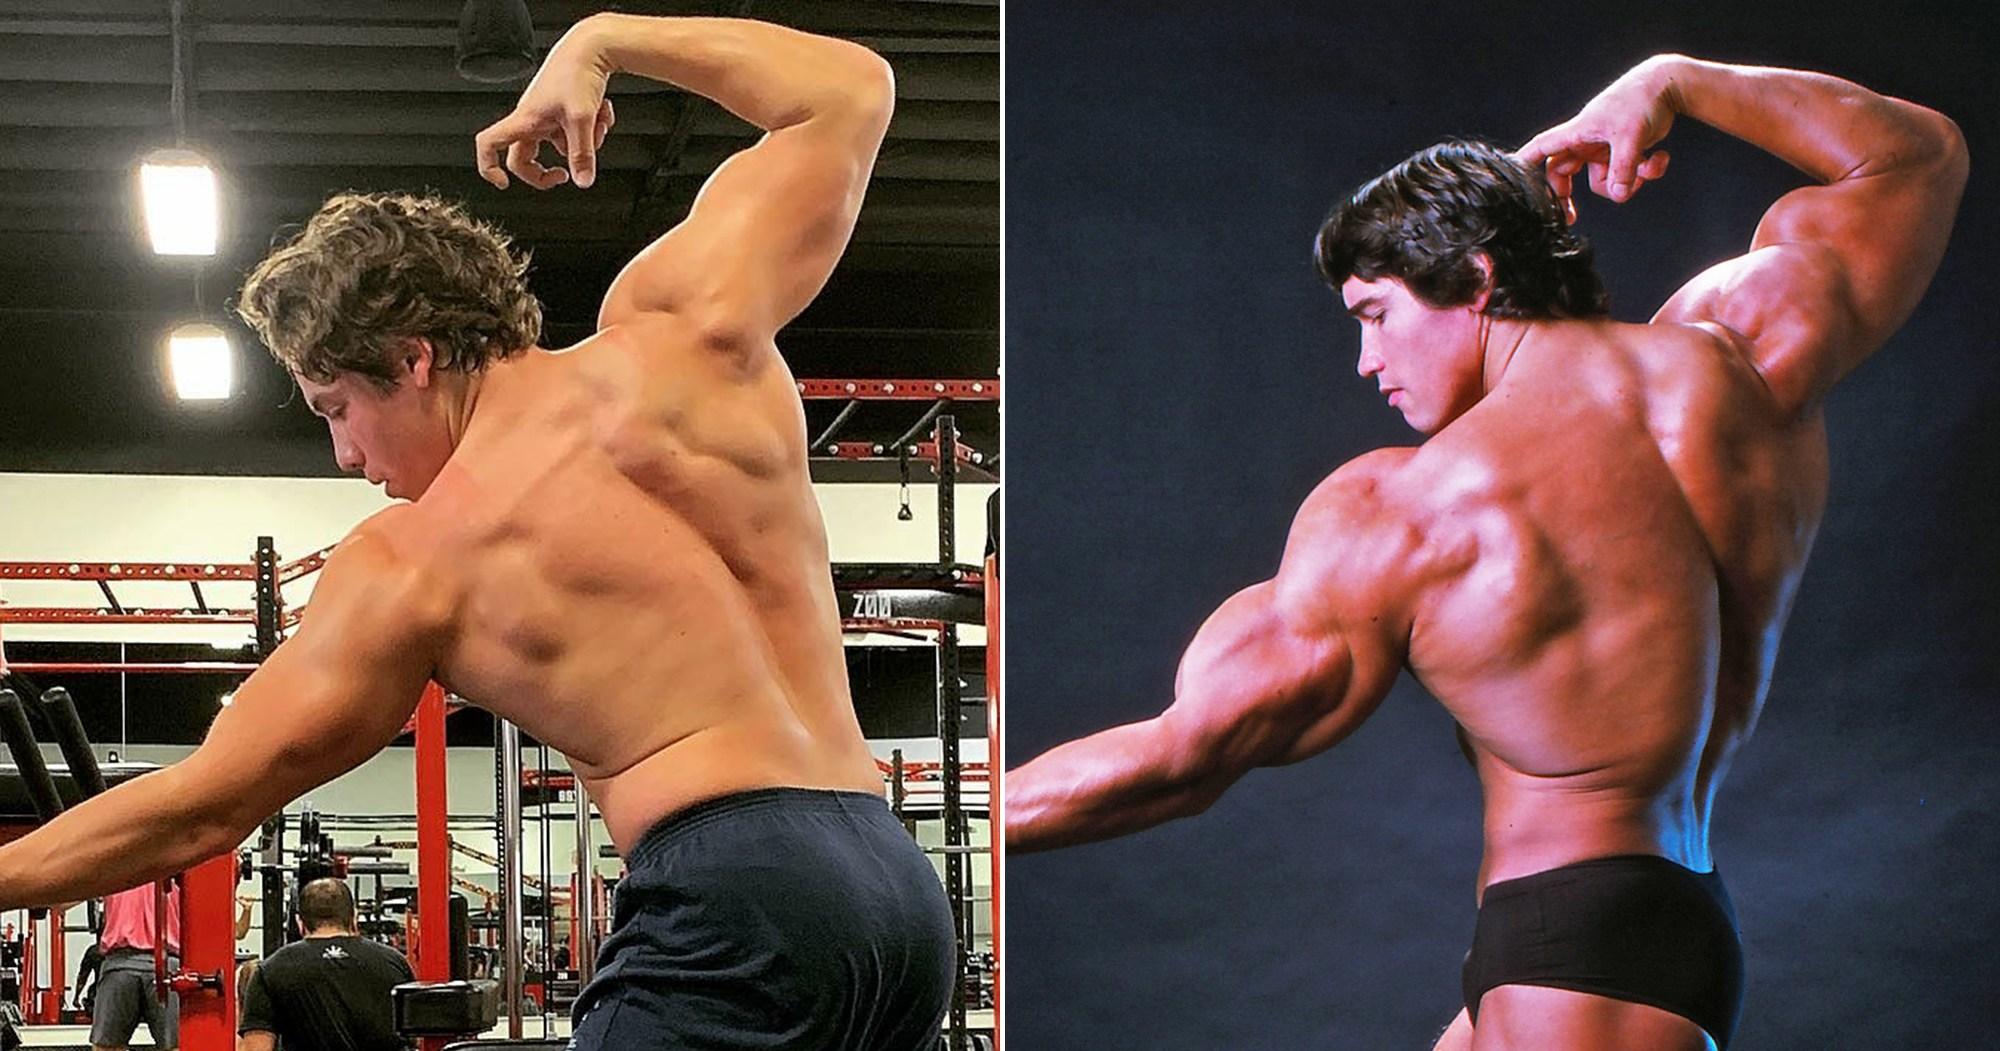 Arnold Schwarzenegger's Son Joseph Recreates His Iconic Bodybuilding Pose